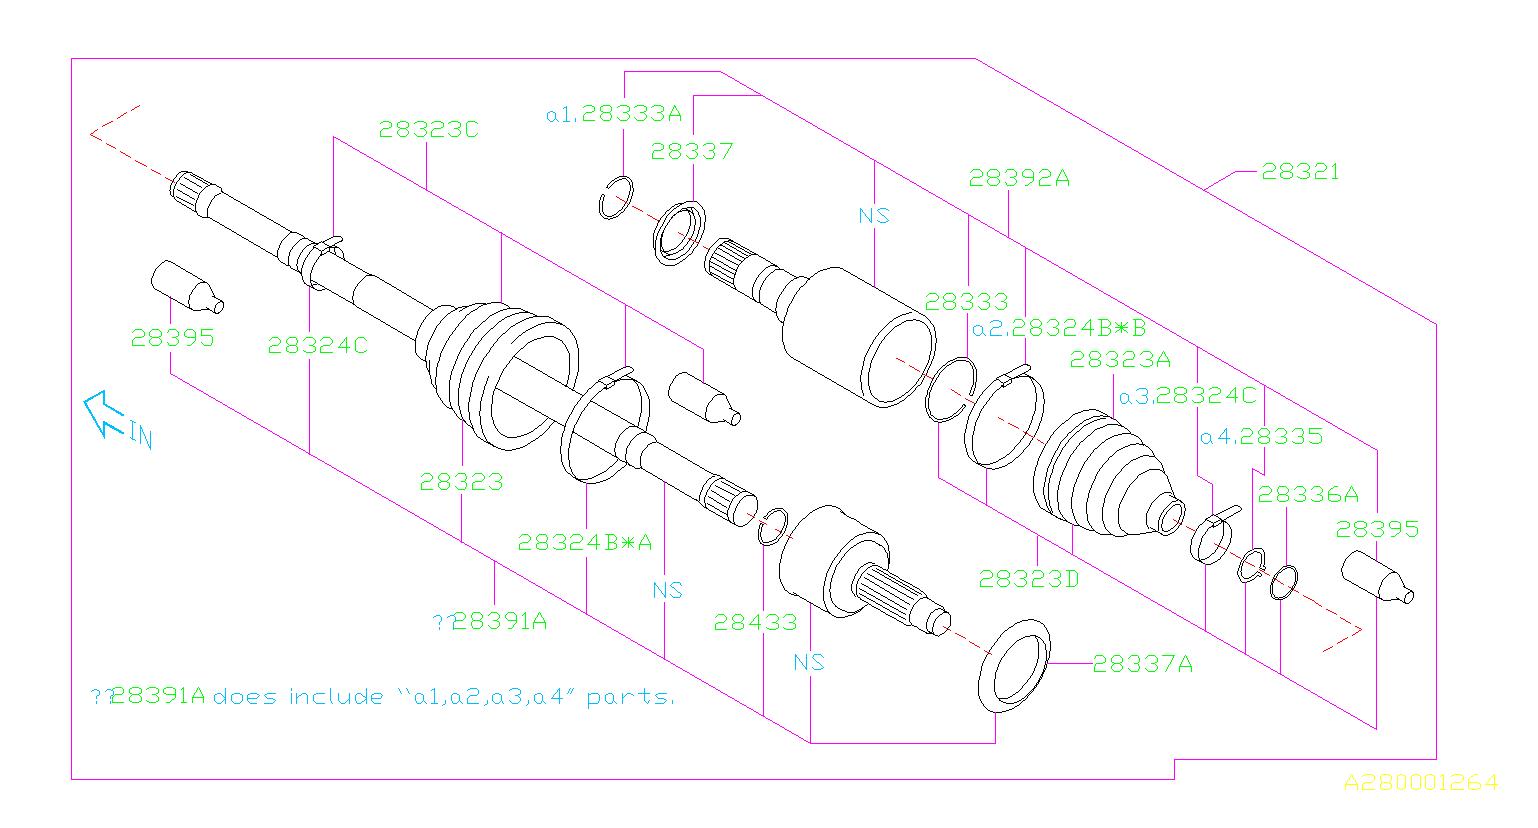 2005 Subaru Impreza Wrx >> 28321FJ020 - Drive shaft assembly-front. Axle, suspension ...